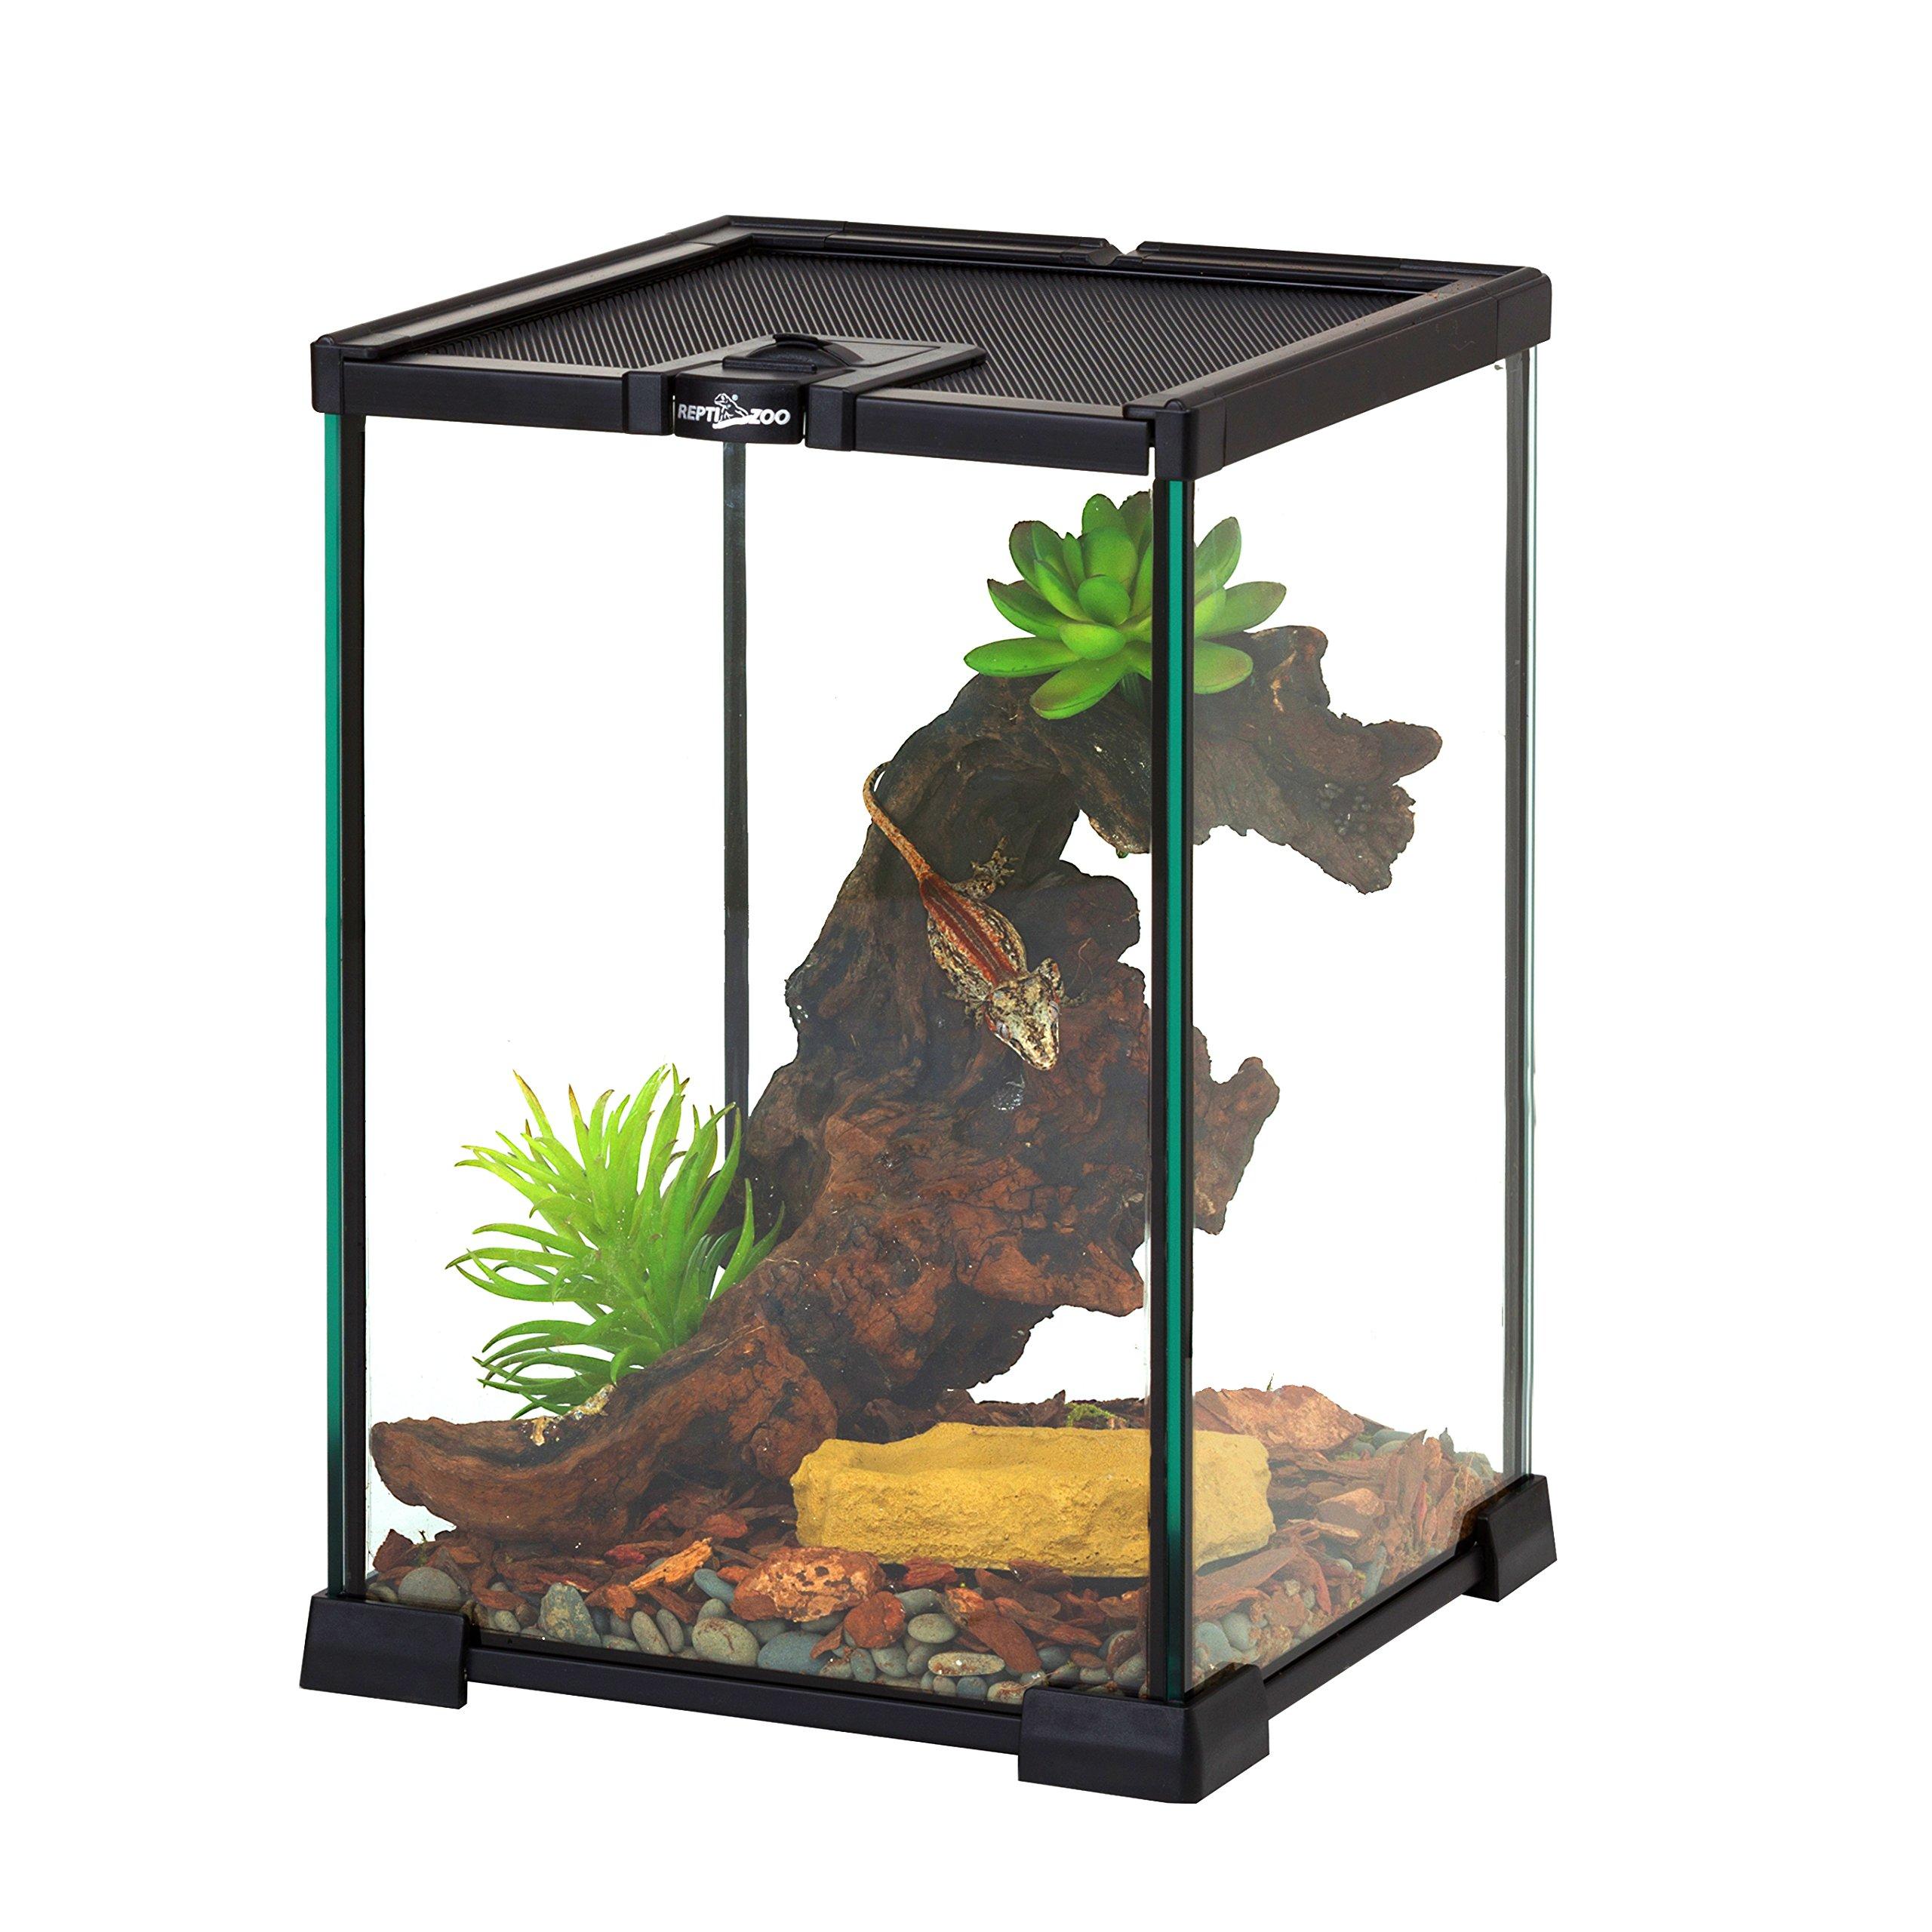 REPTI ZOO Mini Reptile Glass Terrarium,Full View Visually Appealing Mini Reptile Glass Habitat by REPTI ZOO